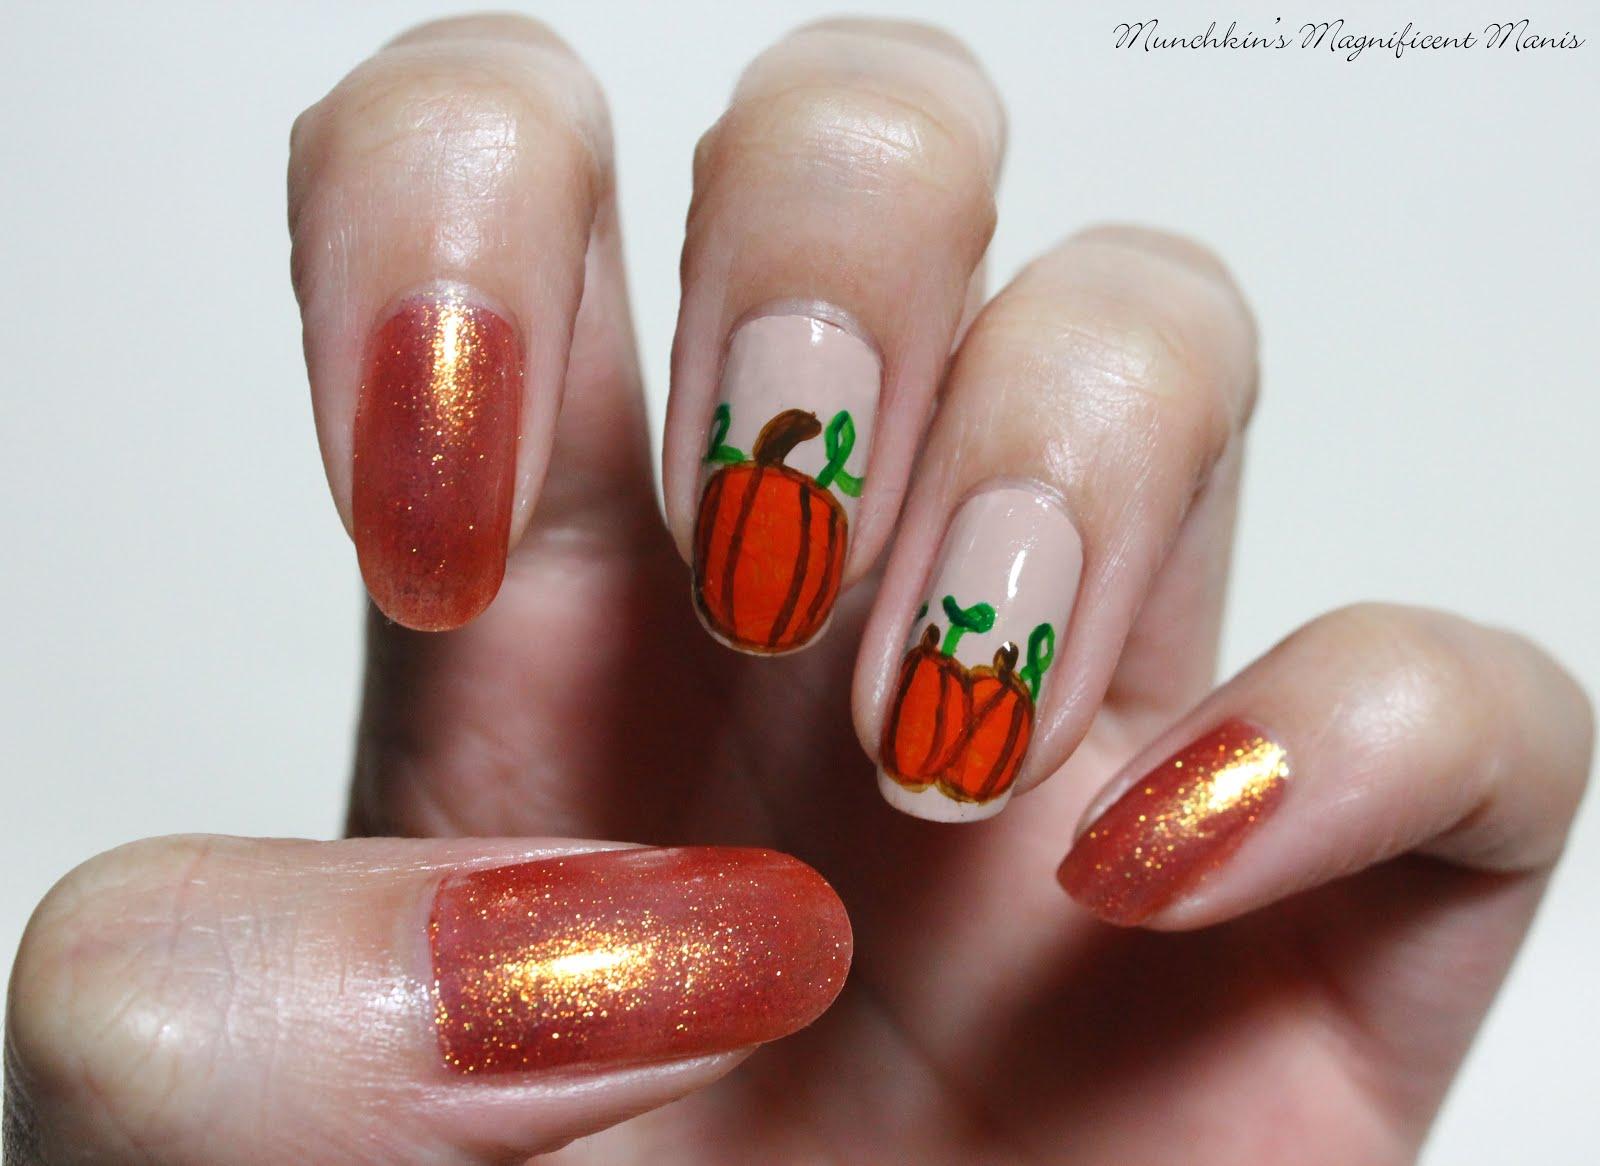 Munchkins Magnificent Manis: Pumpkin Spice- Pumpkin Nail ...